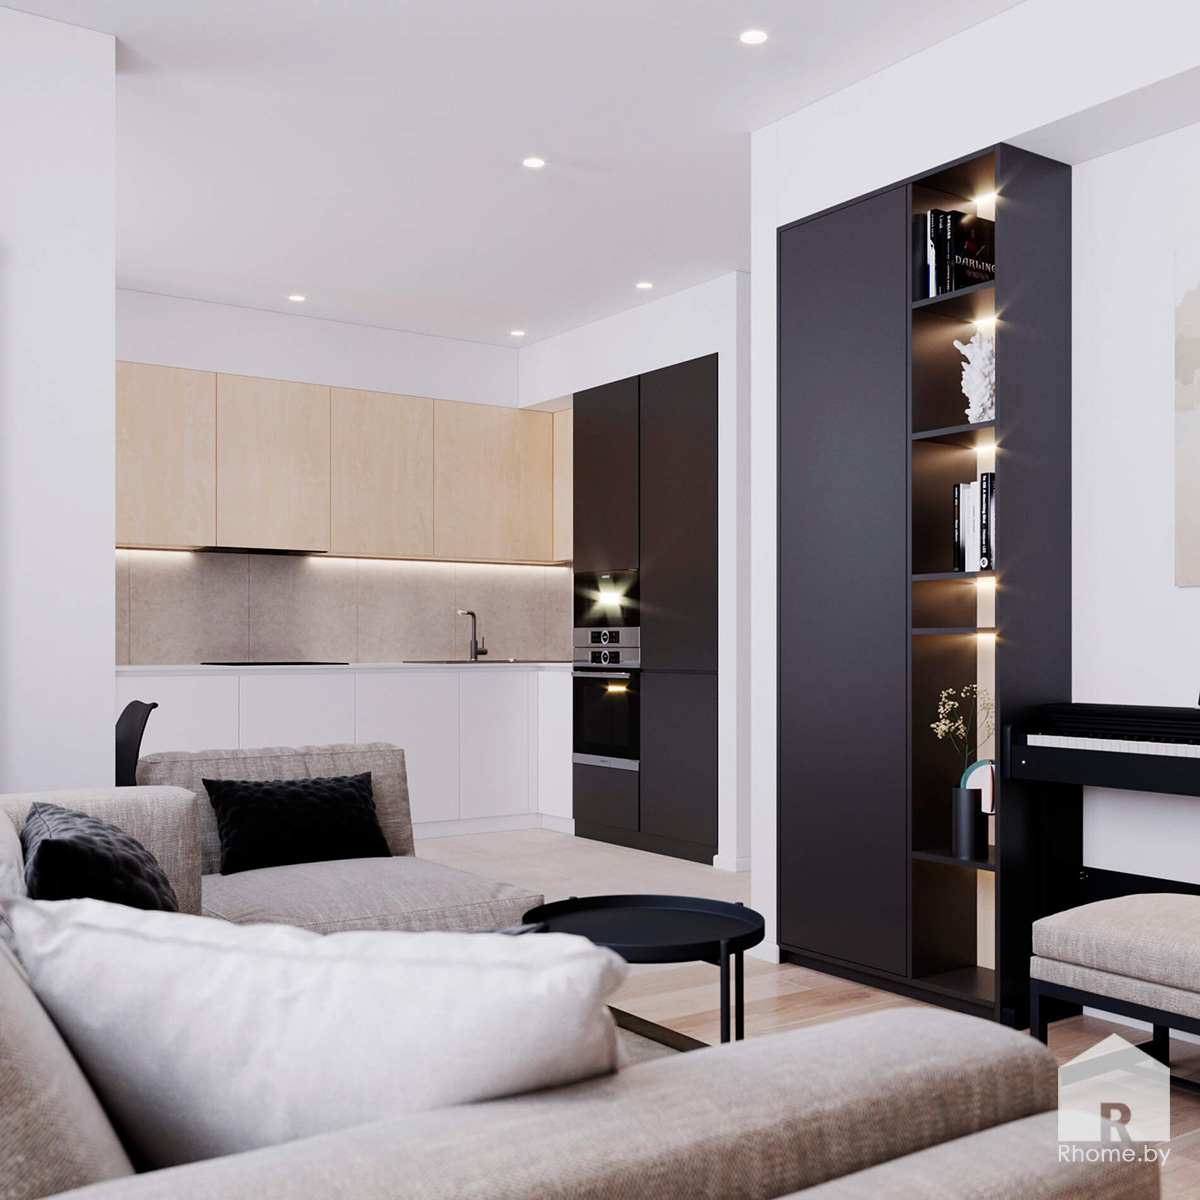 Кухня Гостиная | Дизайн студия – Rhome.by